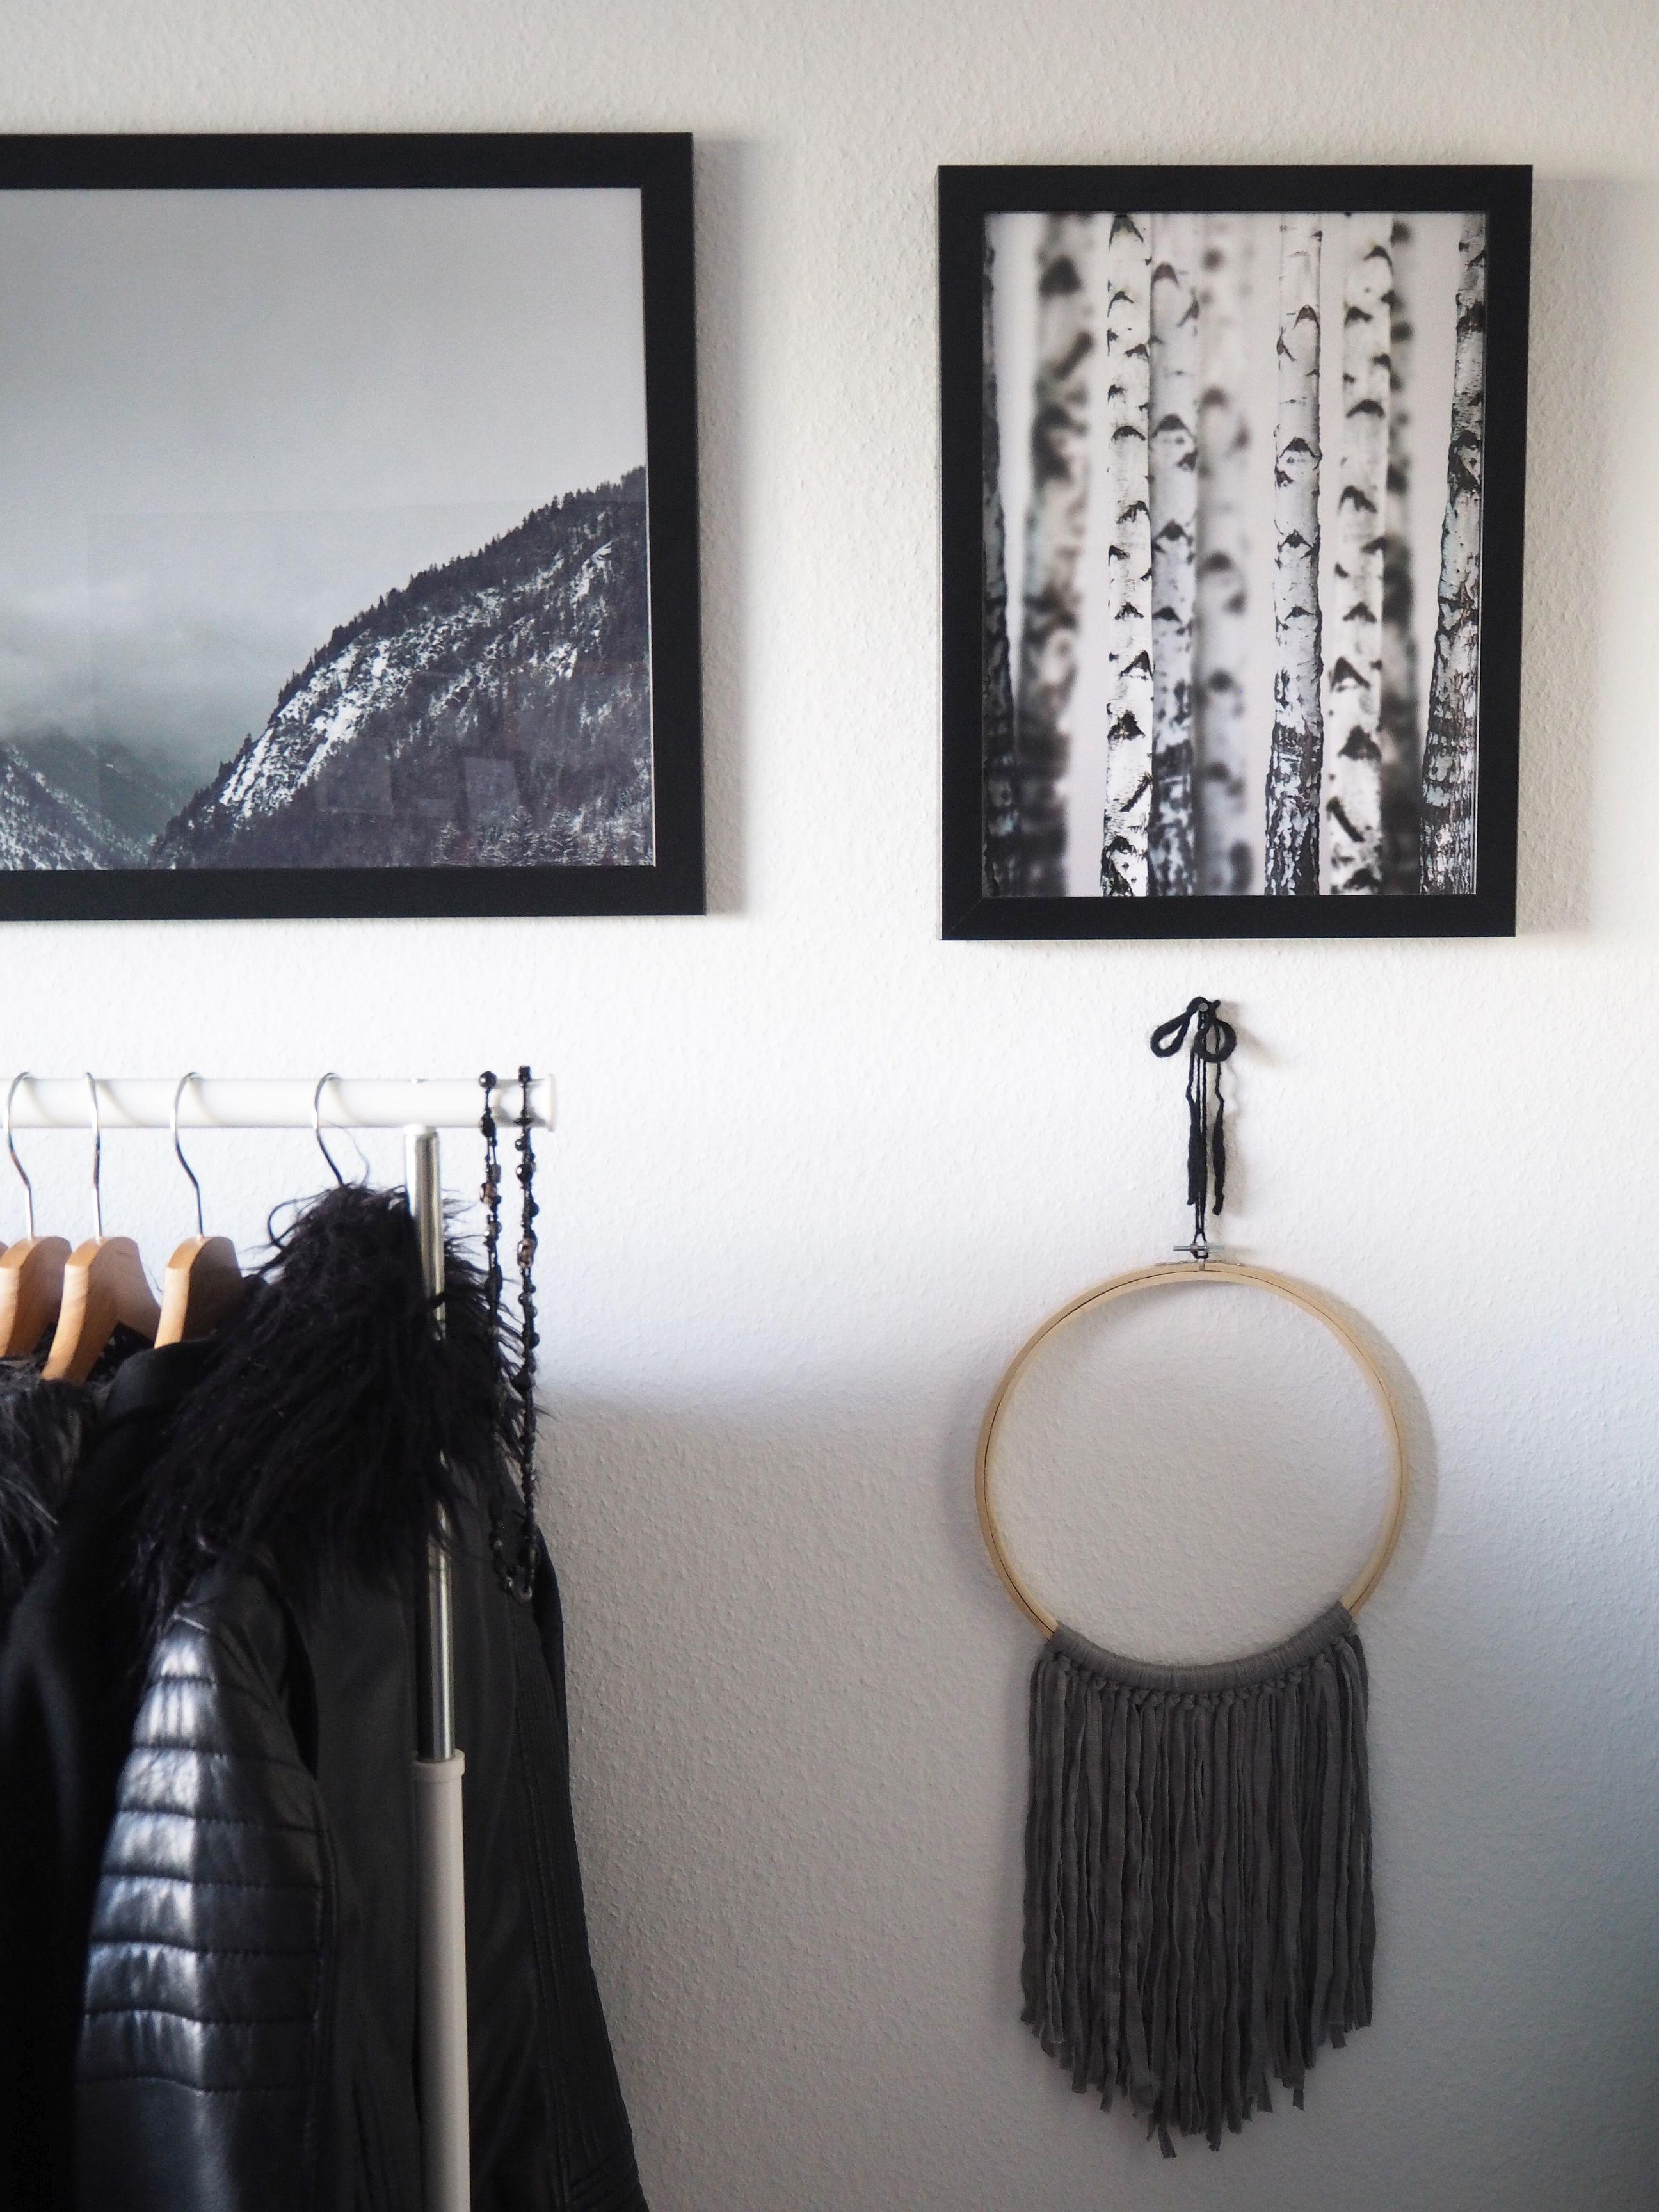 2018-06-skoen-och-kreativ-interior-schlafzimmer-wandgestaltung-pixers-gruen (16)